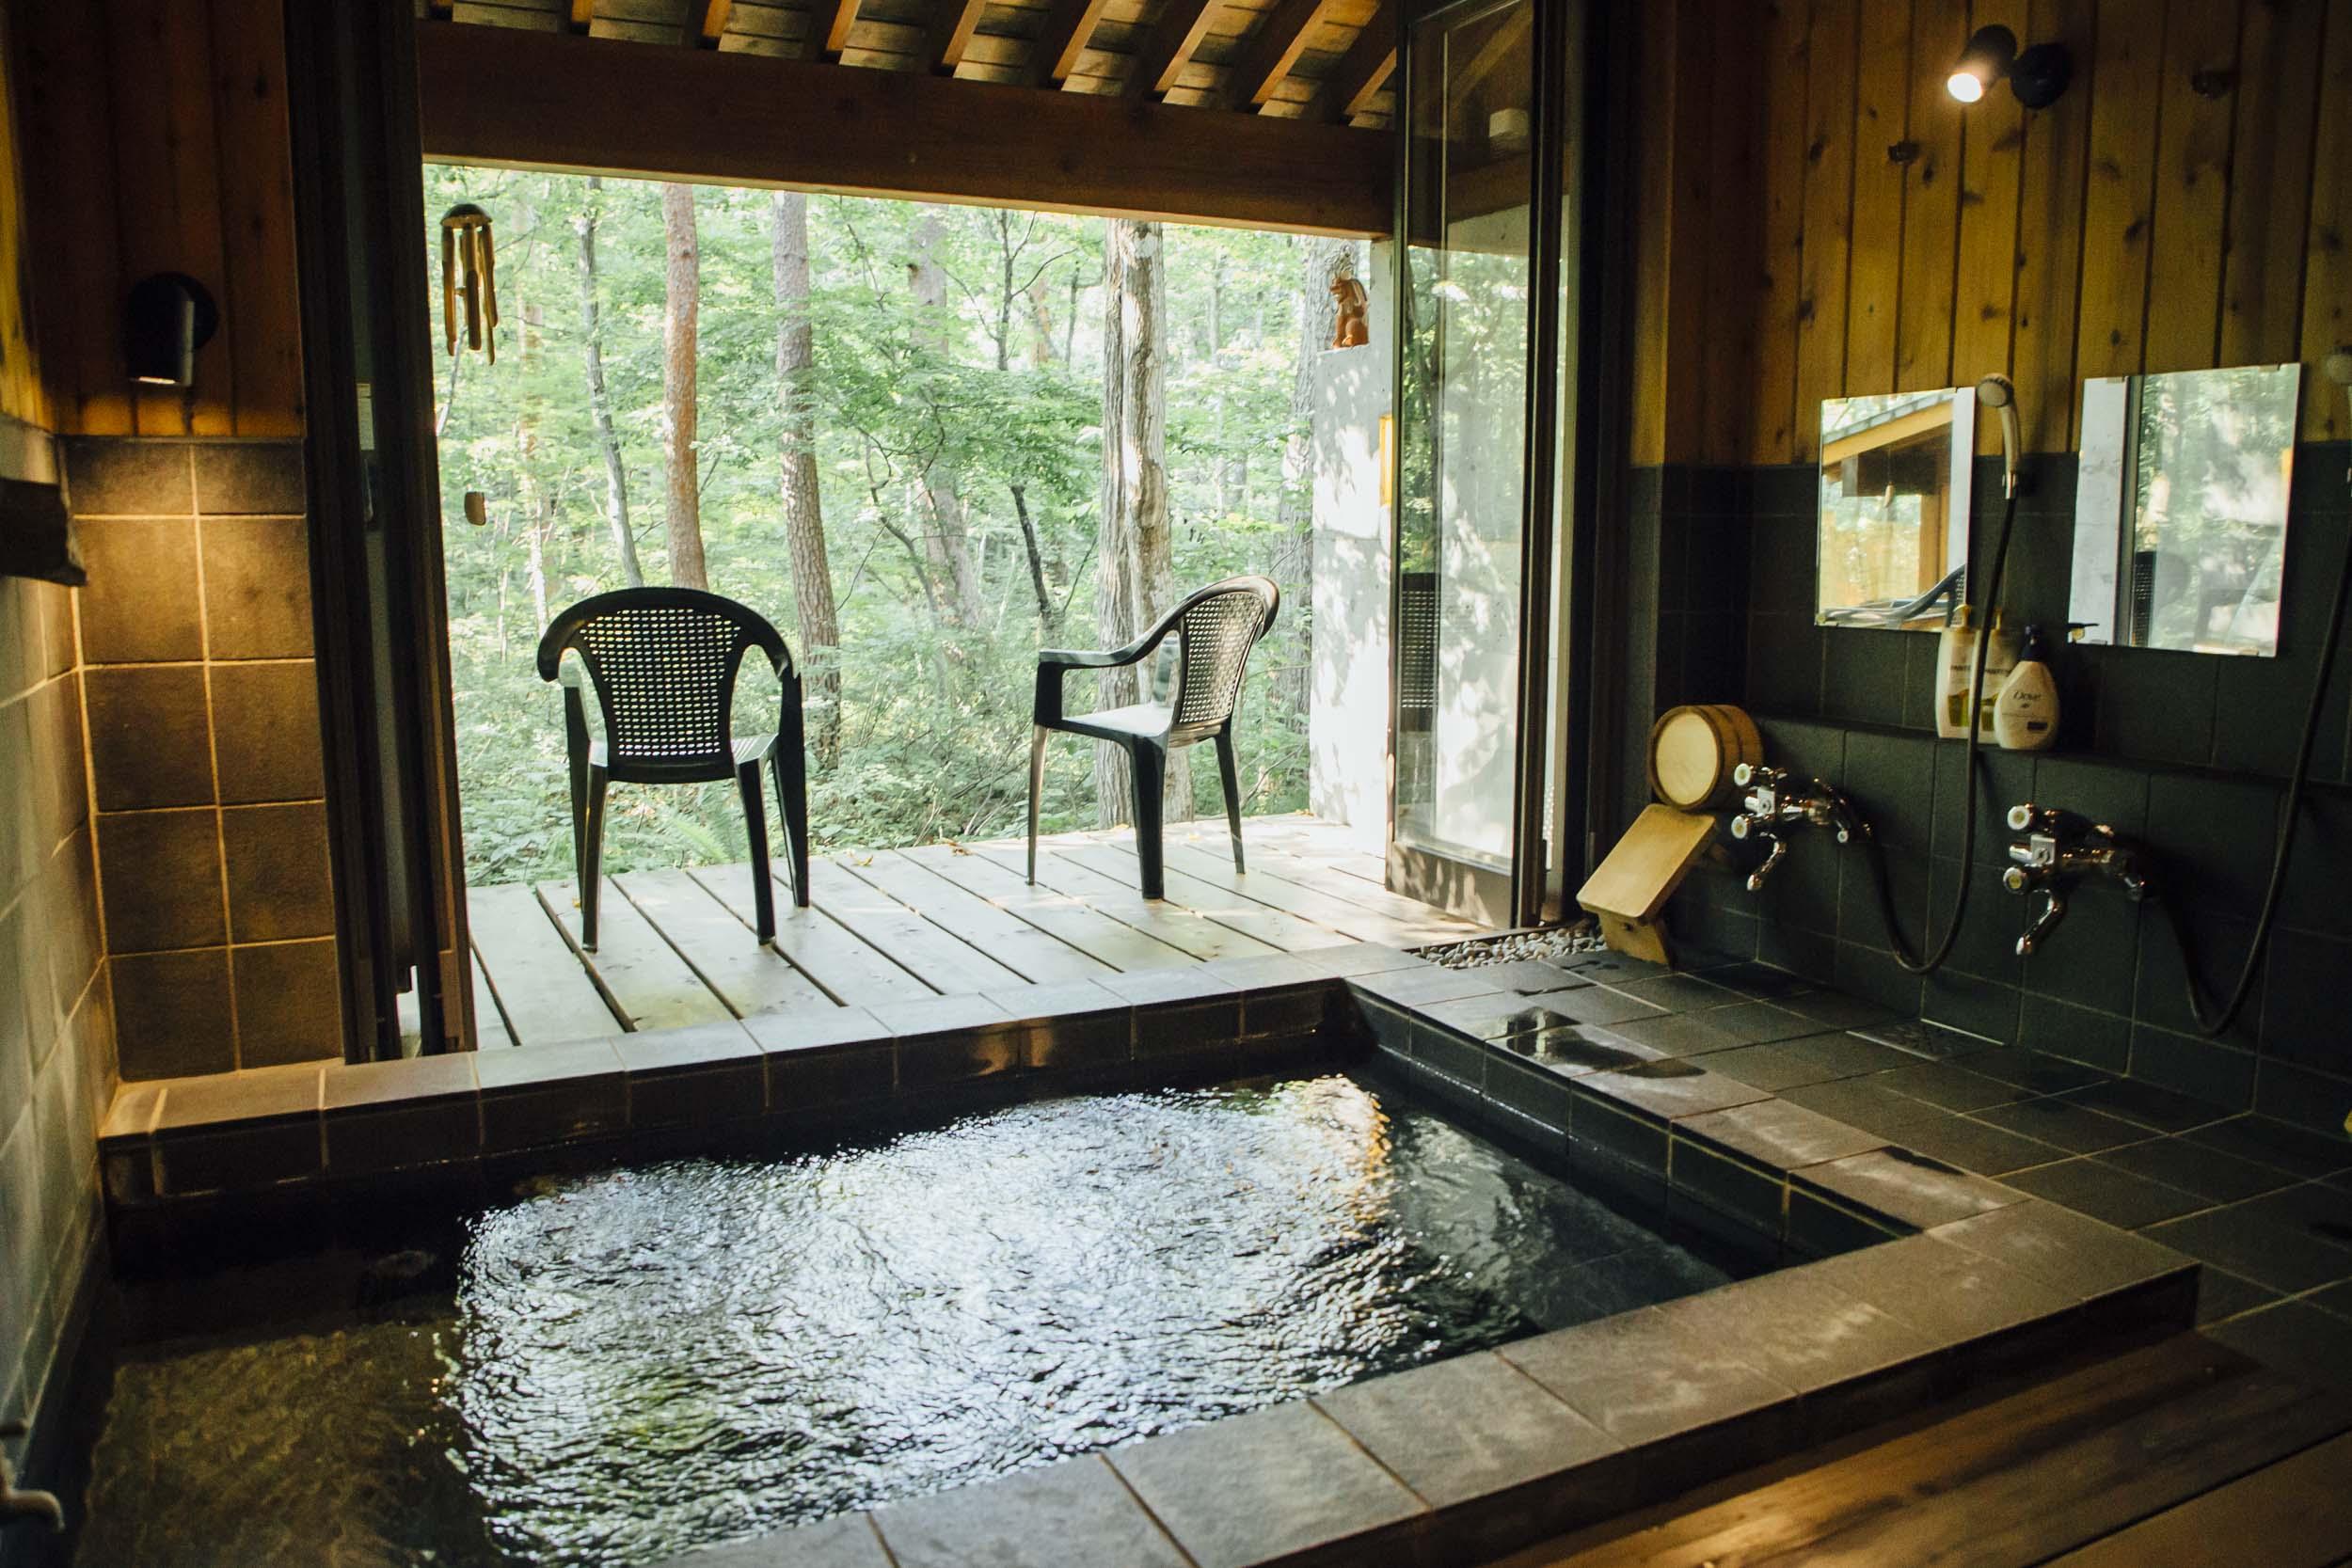 MG_5076 長野県白馬村、Grand Cherokeeオーナーへインタビュー。避暑地としてもアクティブに過ごすにも良し!カフェ観光スポットもご紹介